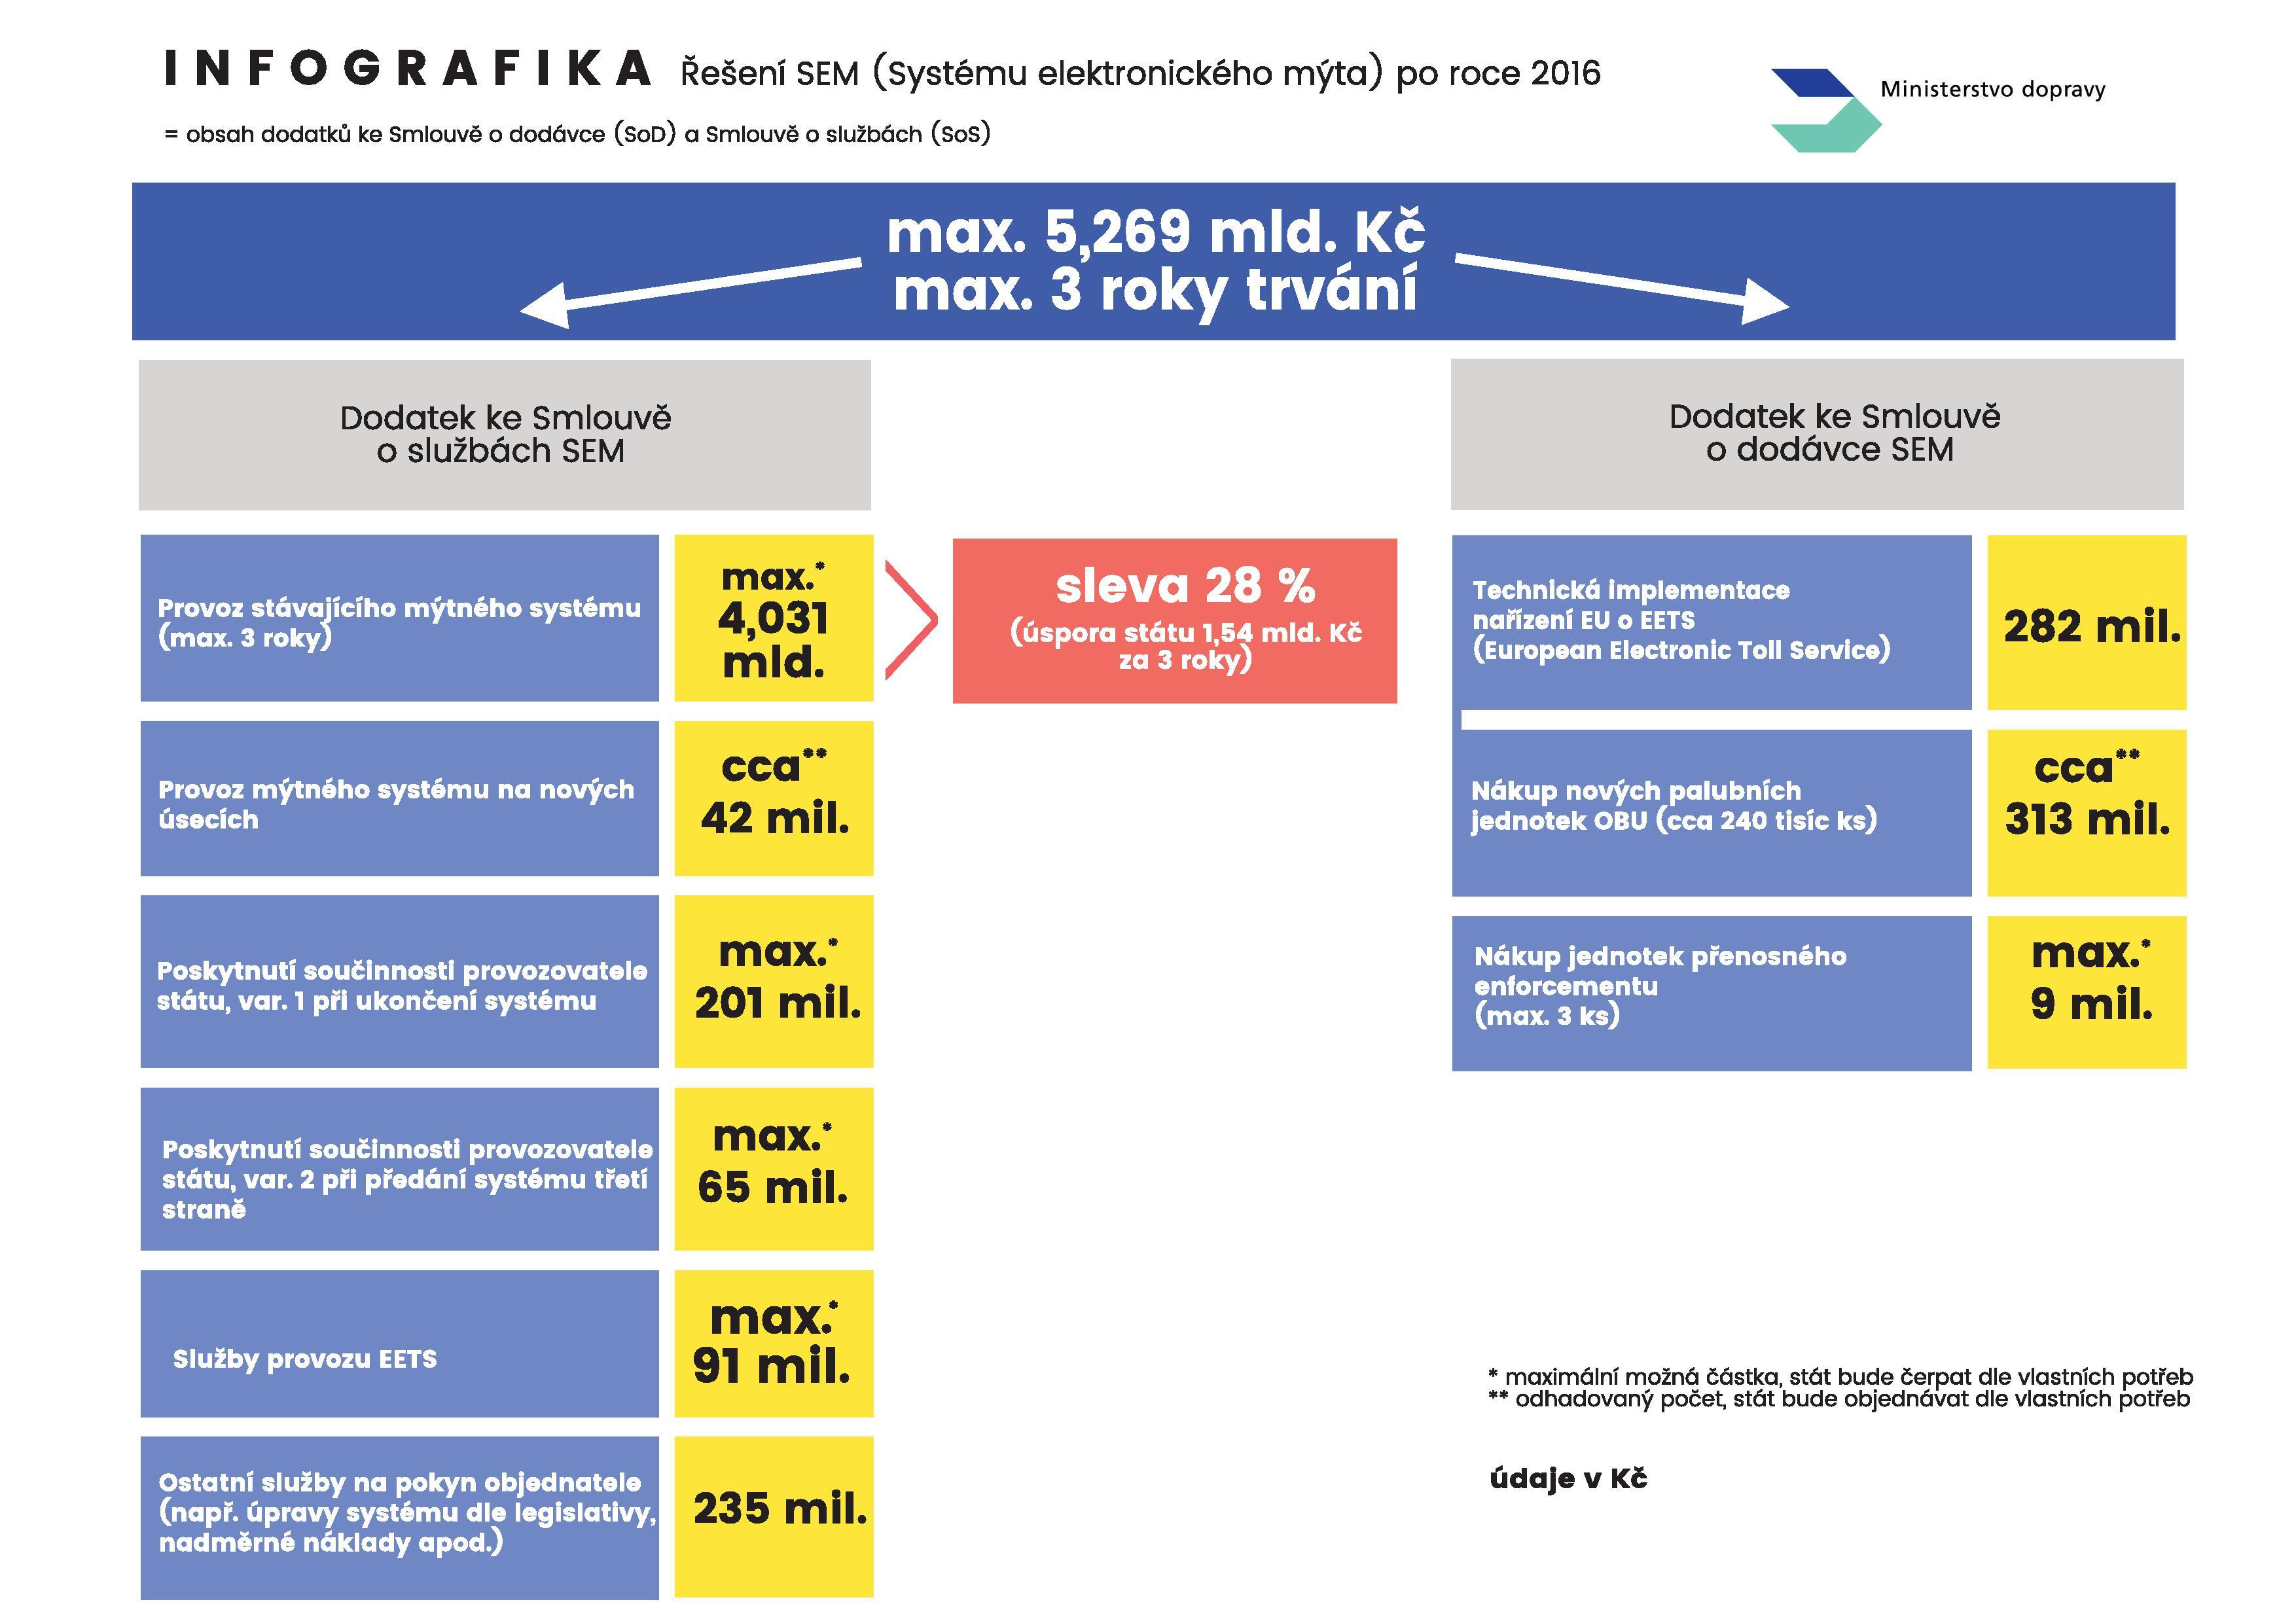 infografikaMDpage001.jpg